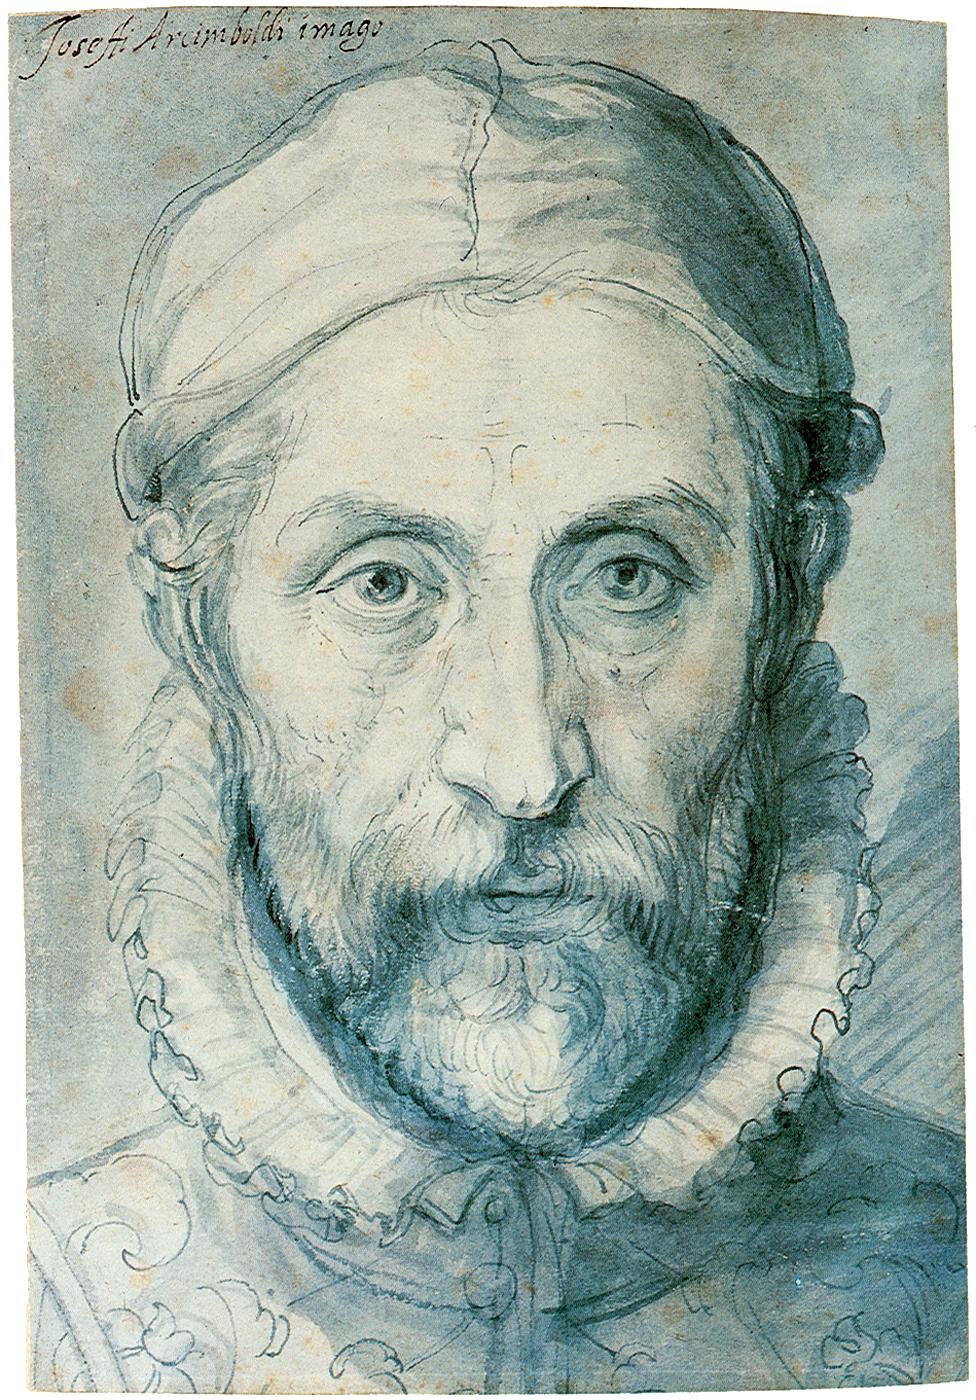 http://upload.wikimedia.org/wikipedia/commons/4/4a/Giuseppe_Arcimboldo.jpg